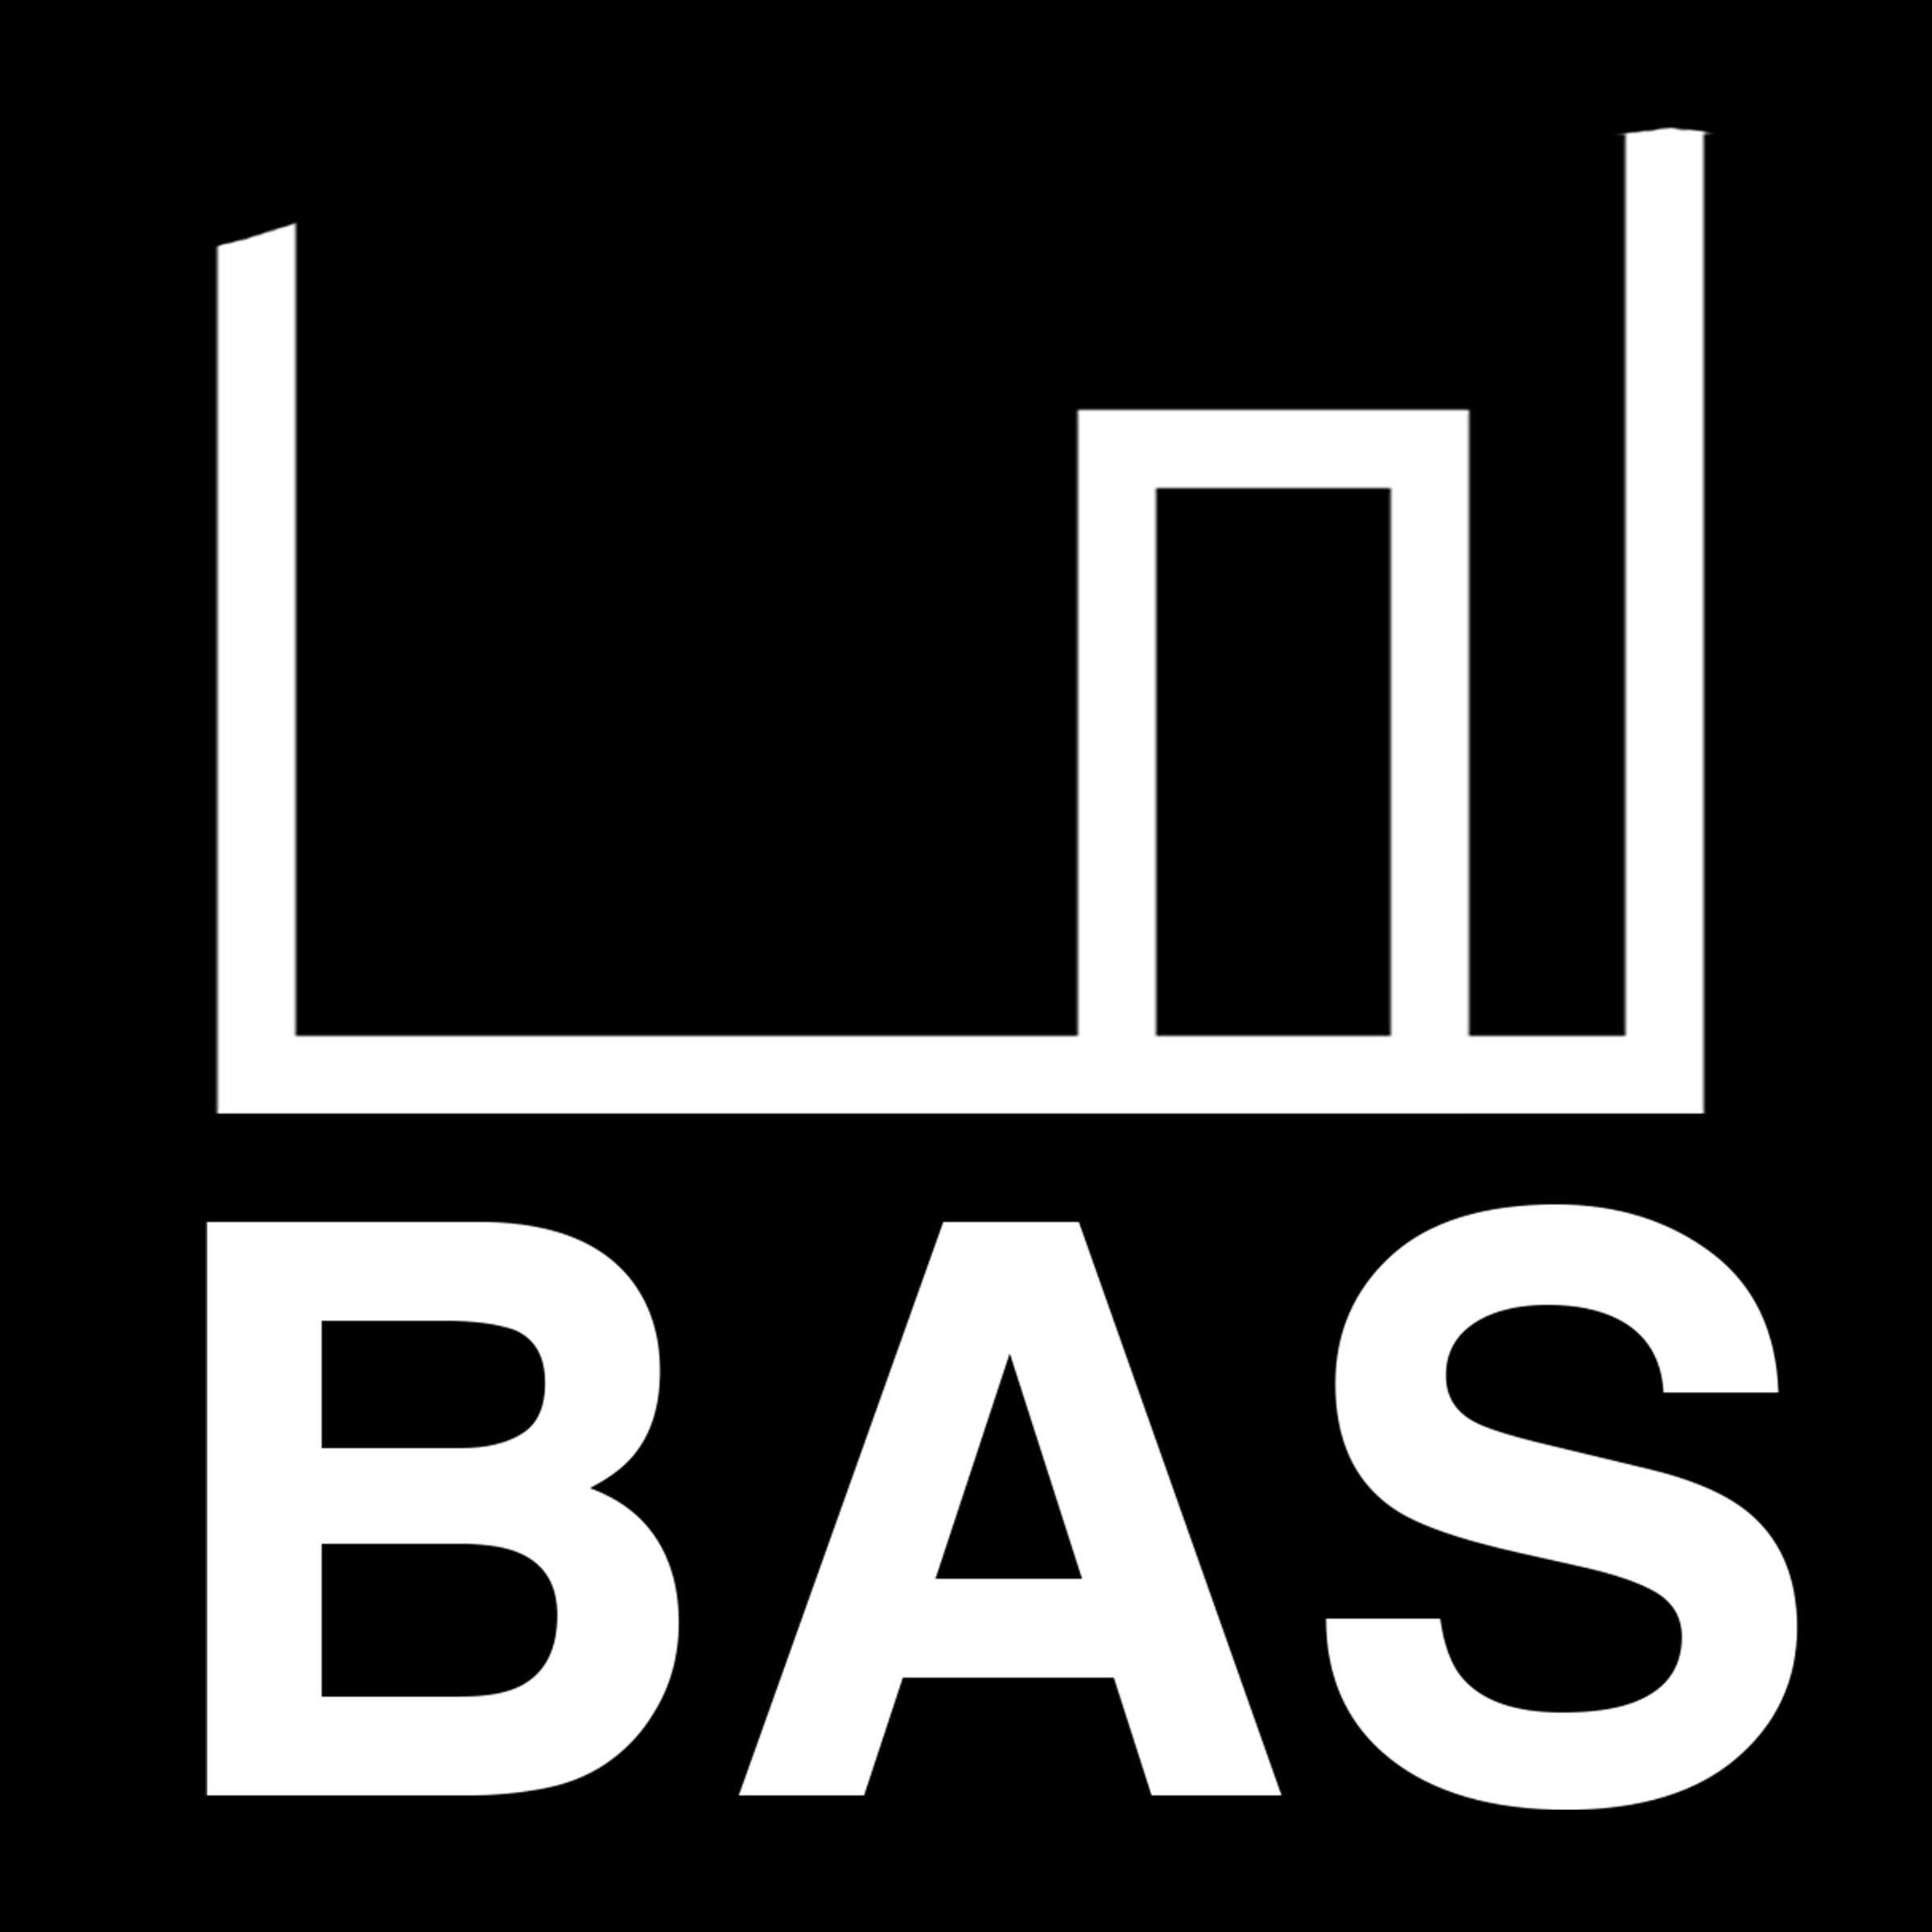 BAS BLK BCK LOGO ICON (1).png